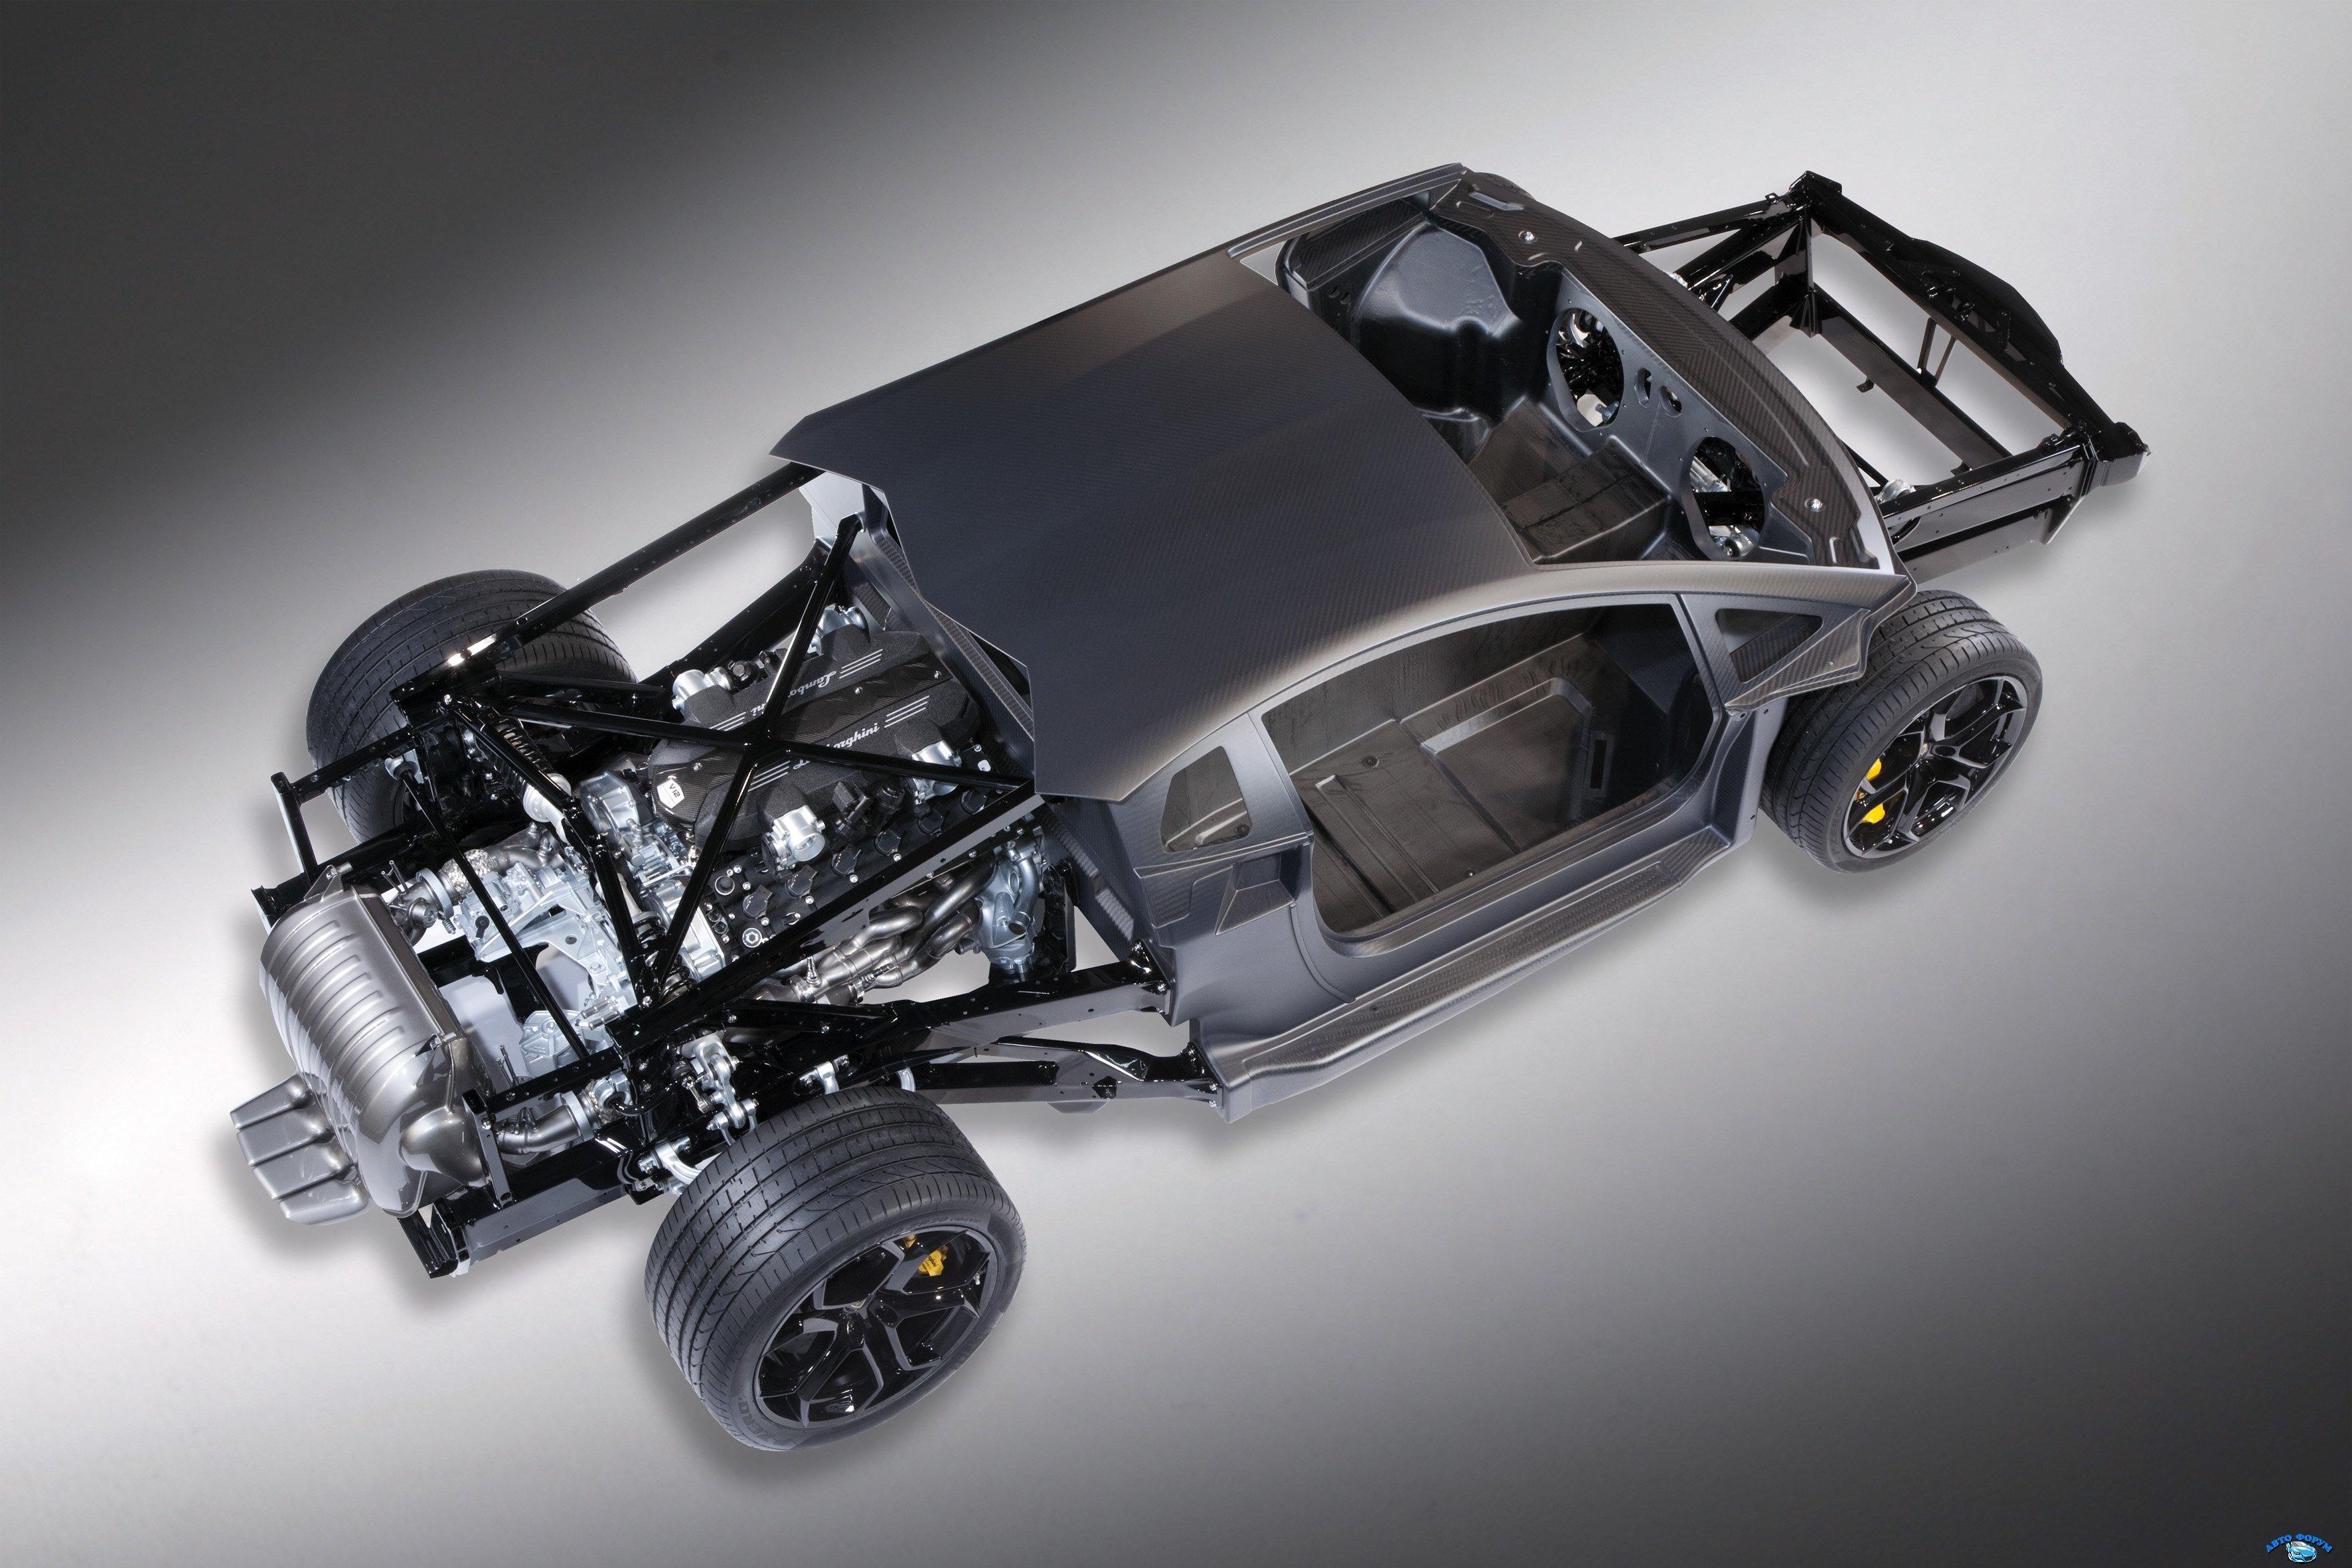 lamborghini_aventador_lp_700-4_chassis_27.jpg